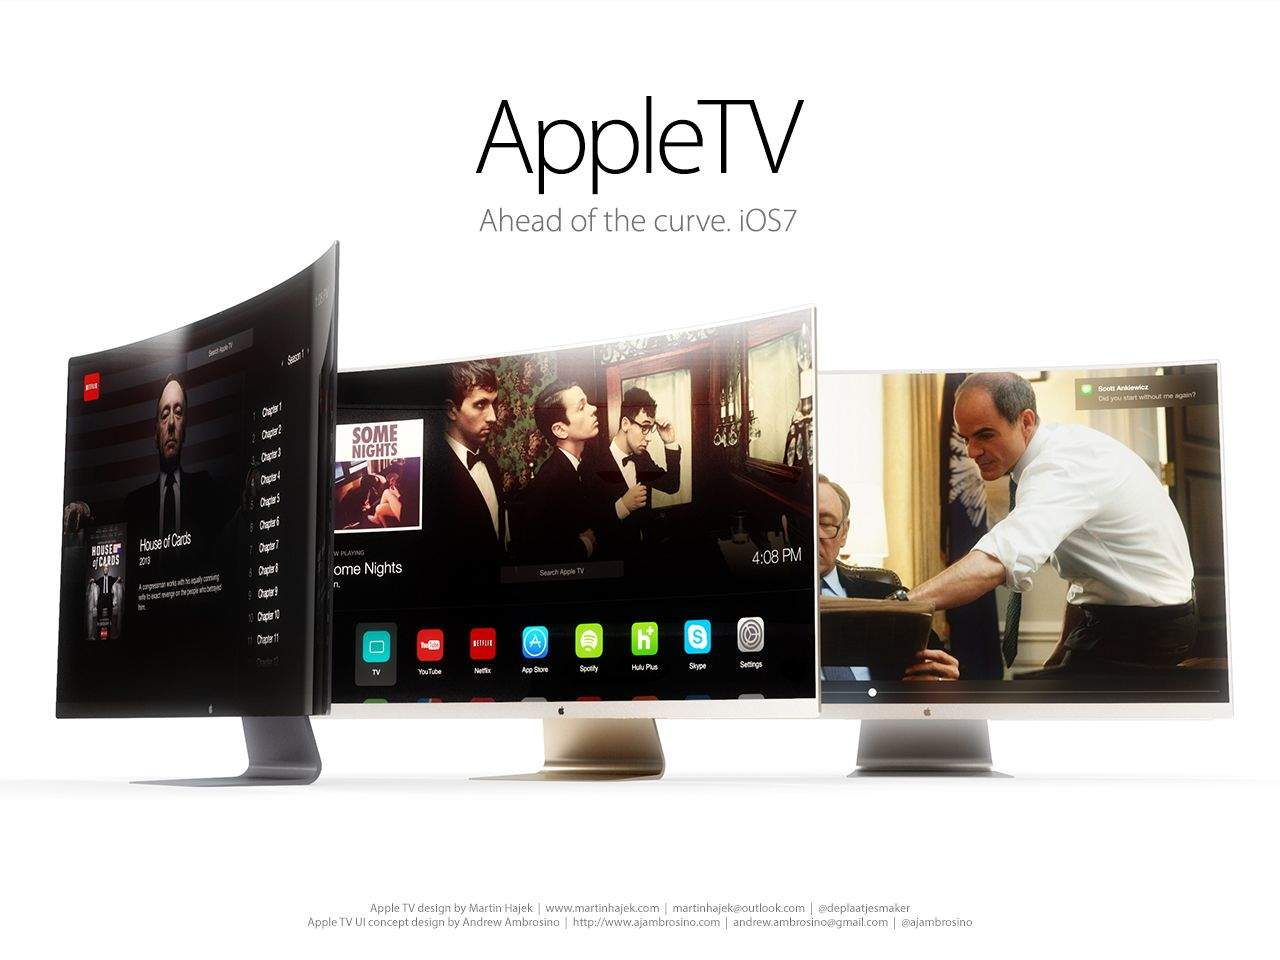 appletv_view1